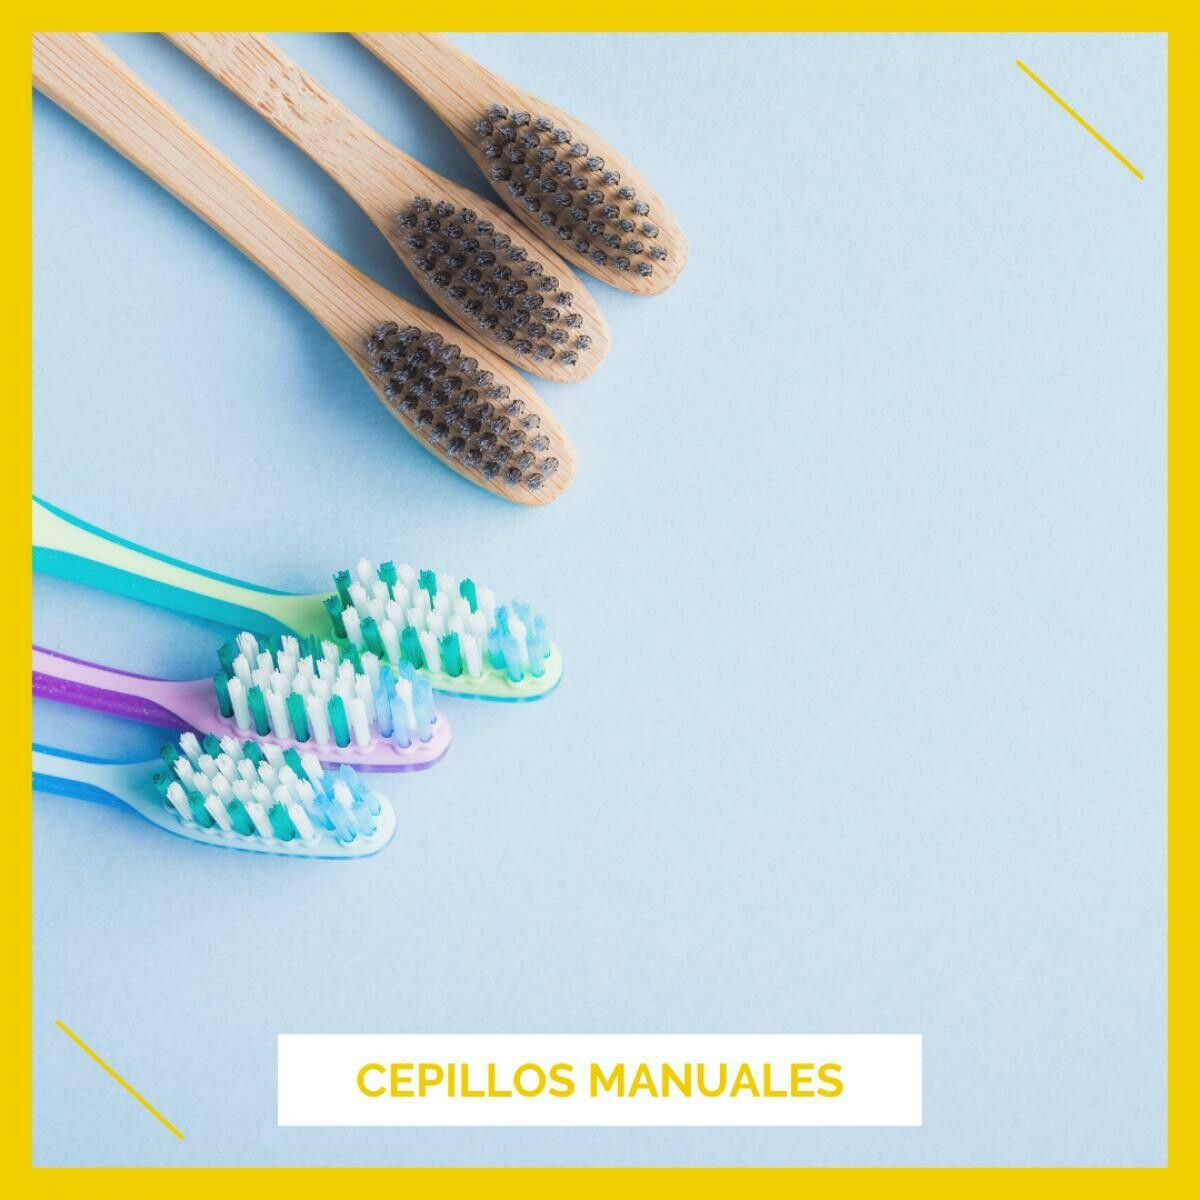 Cepillos manuales e interdentales